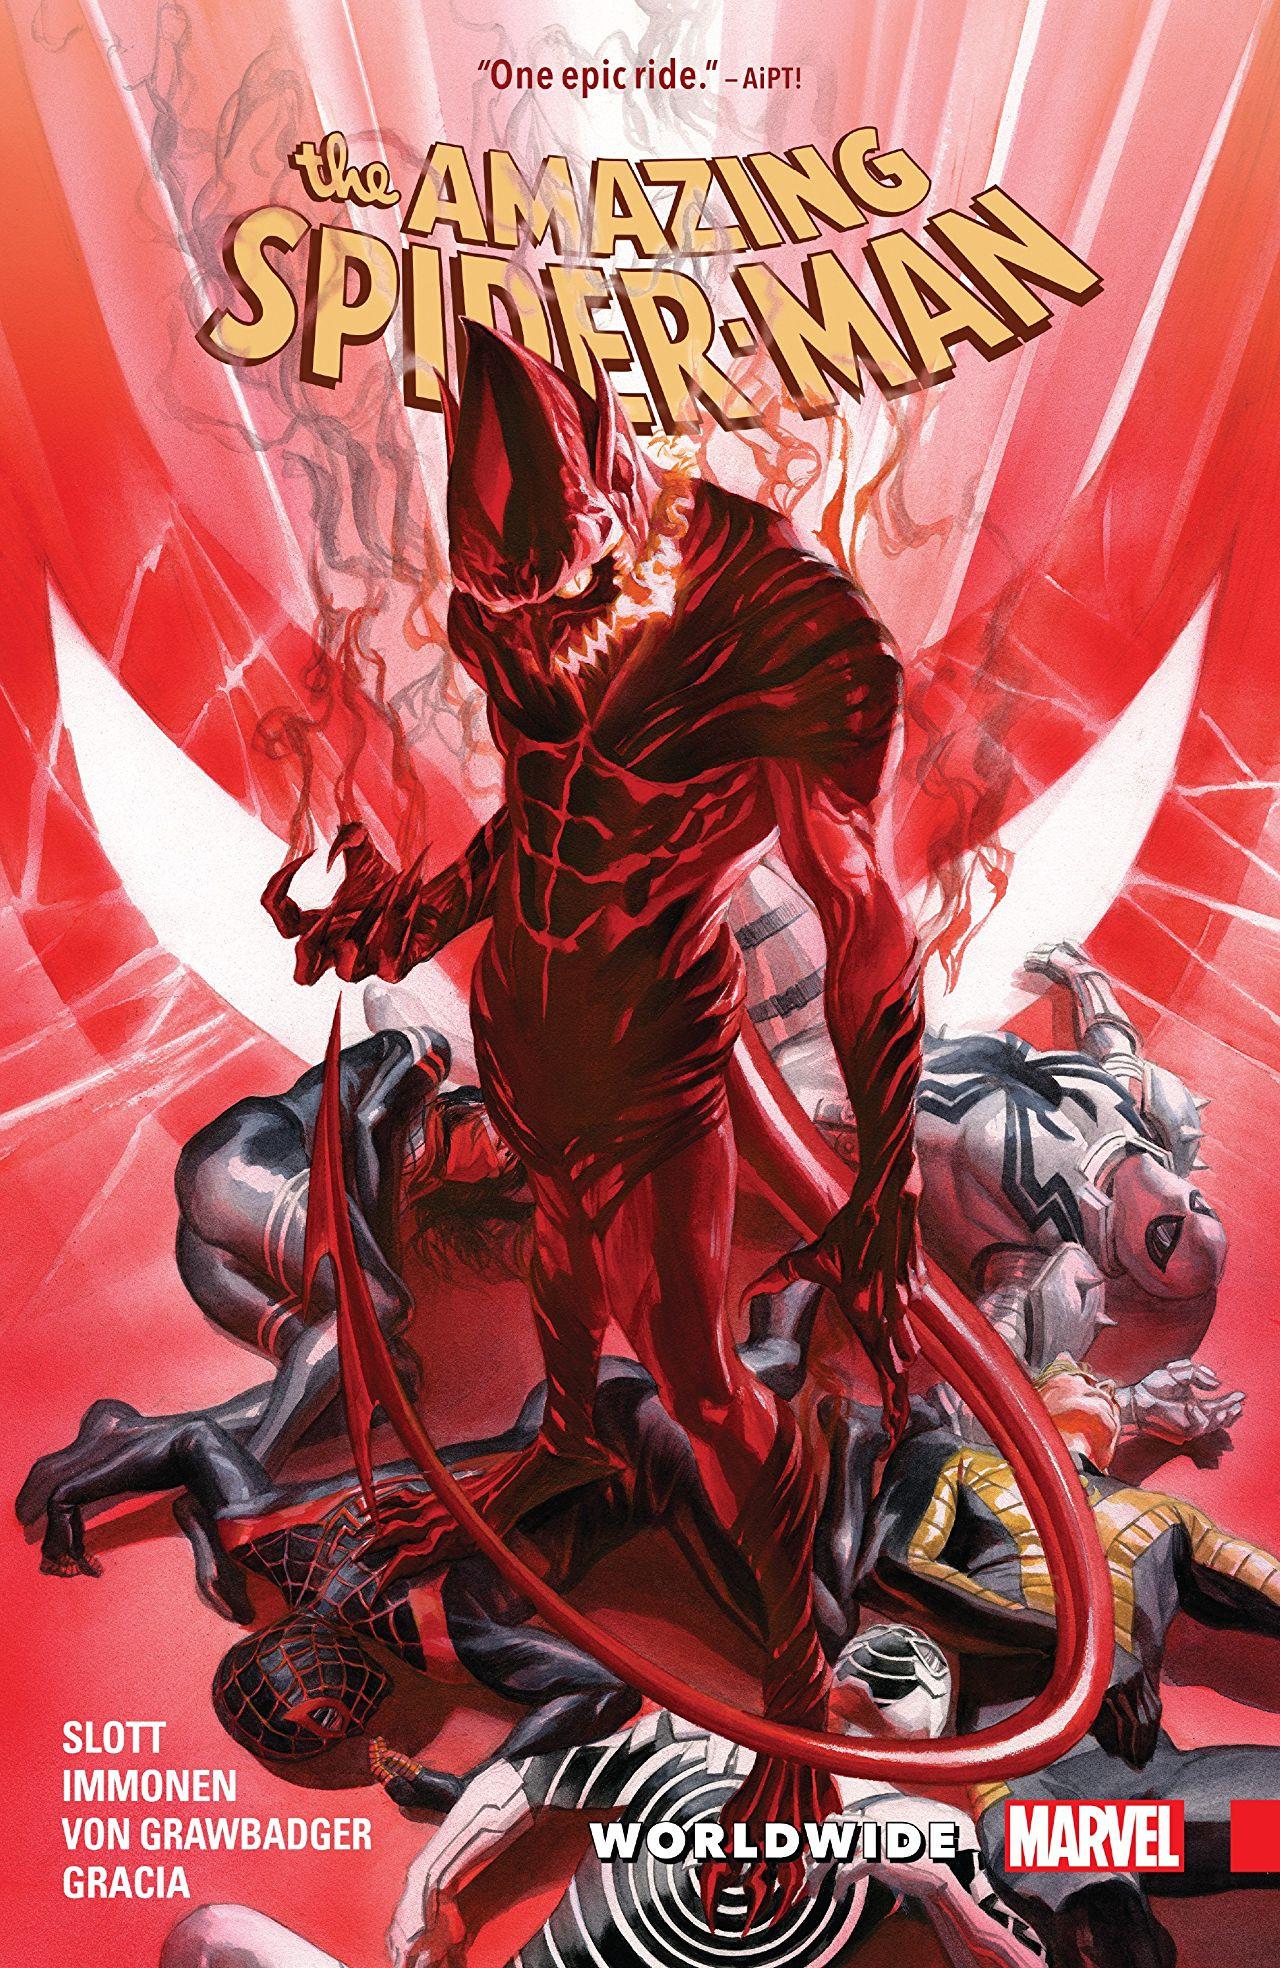 Amazing Spider-Man: Worldwide TPB Vol 1 9